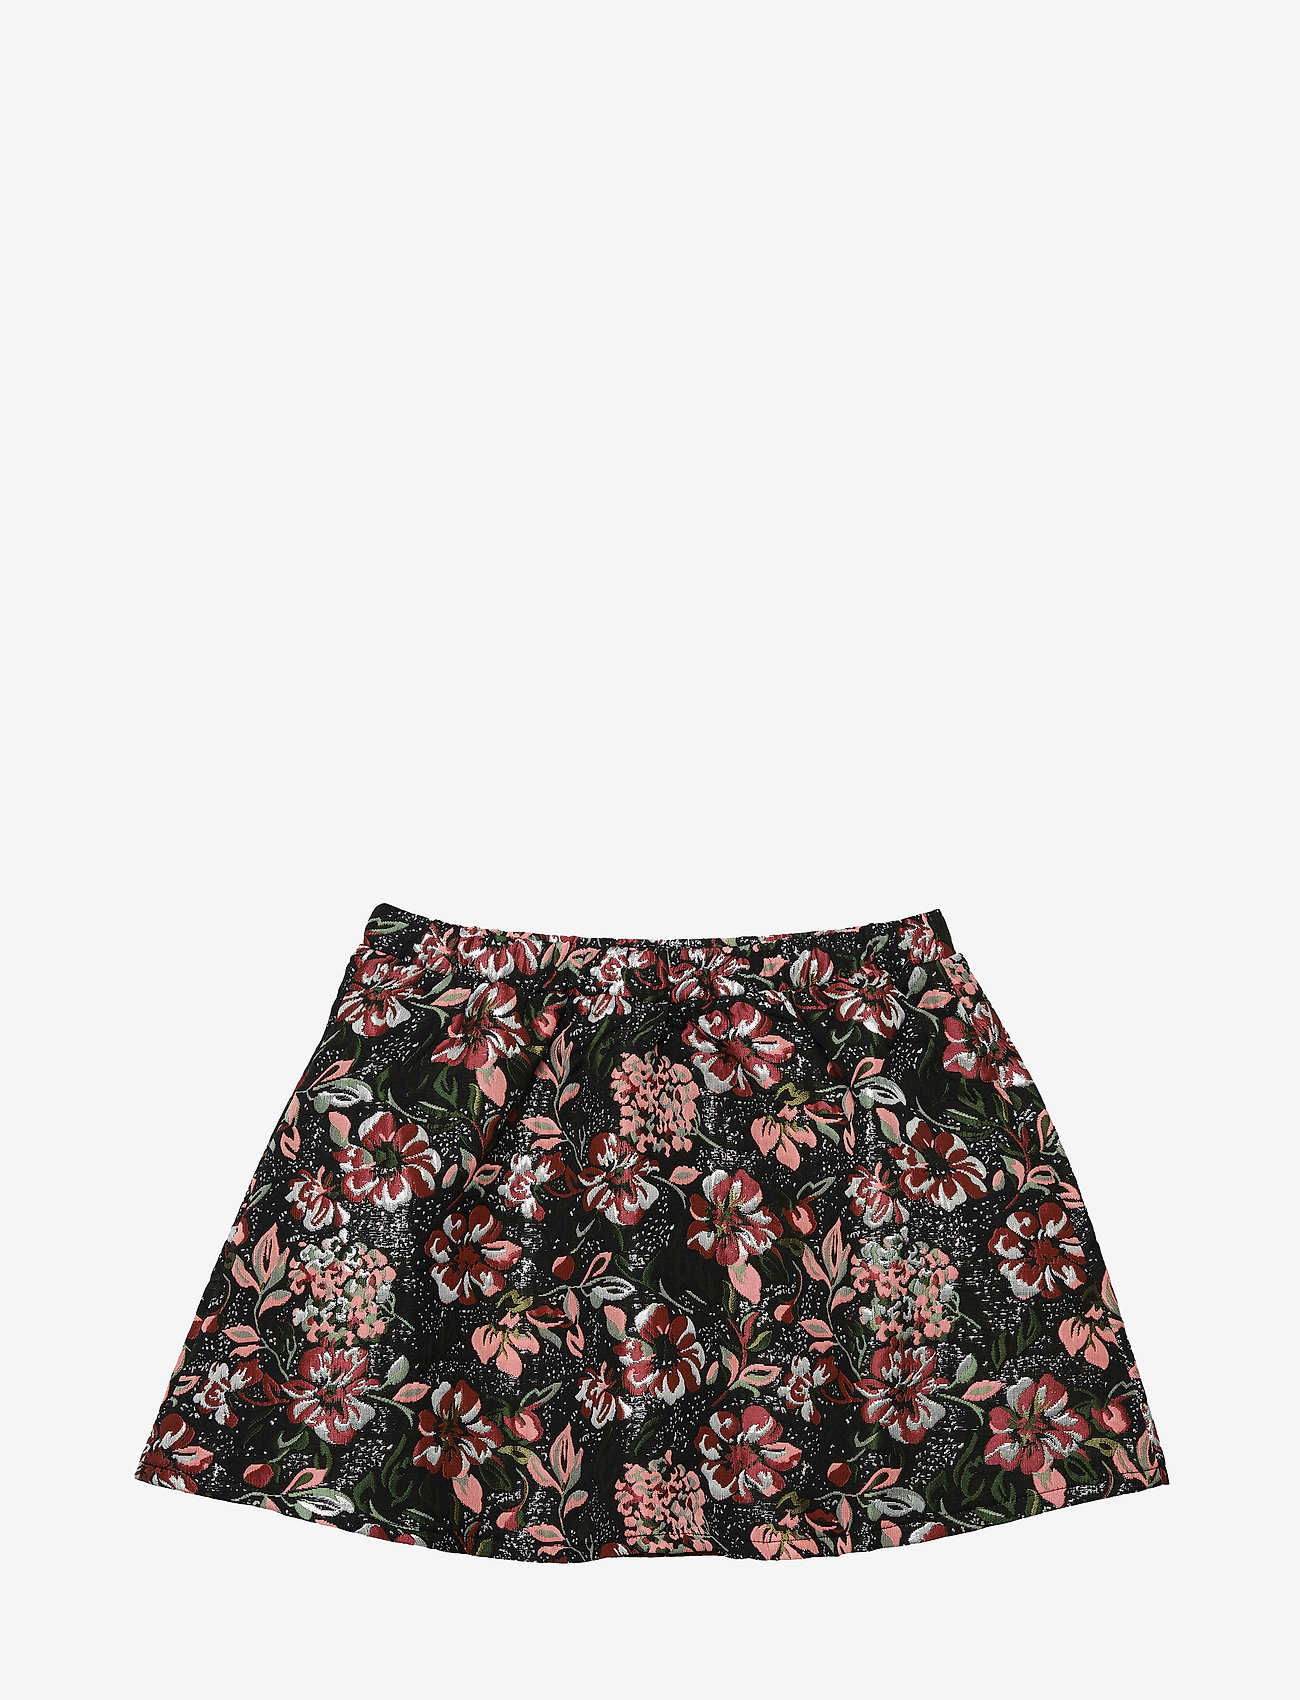 Petit by Sofie Schnoor - Skirt - nederdele - blk flower - 1